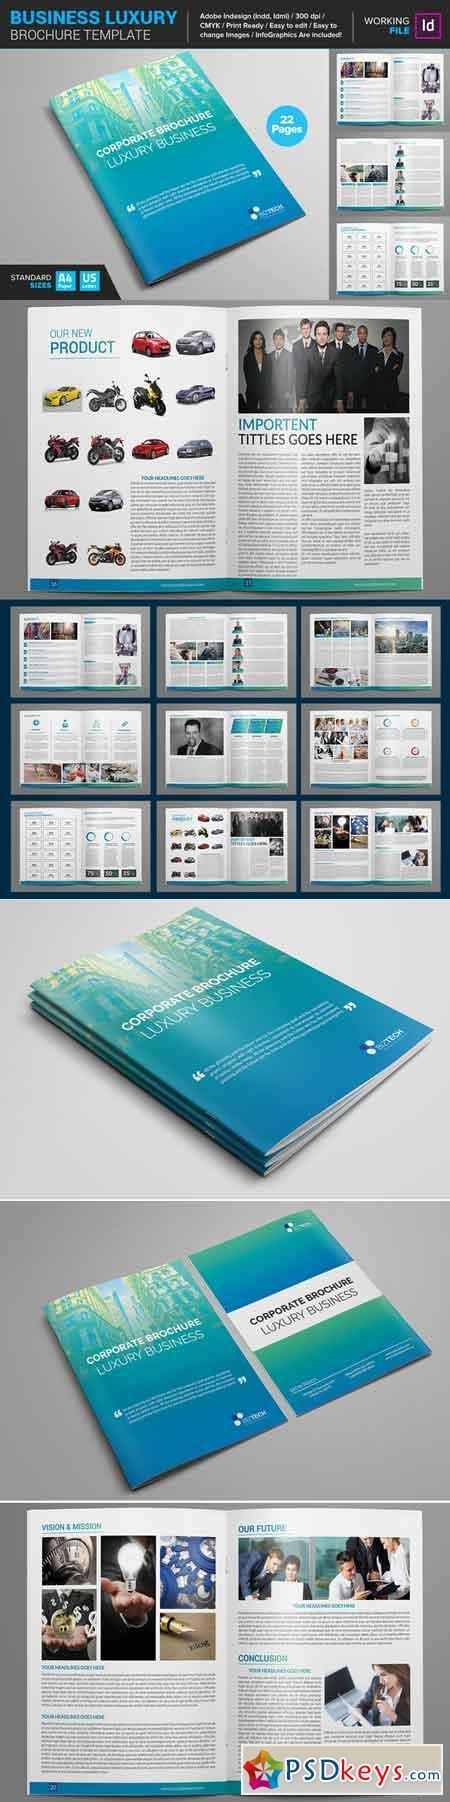 Business luxury brochure template 661817 free download for Luxury brochure template